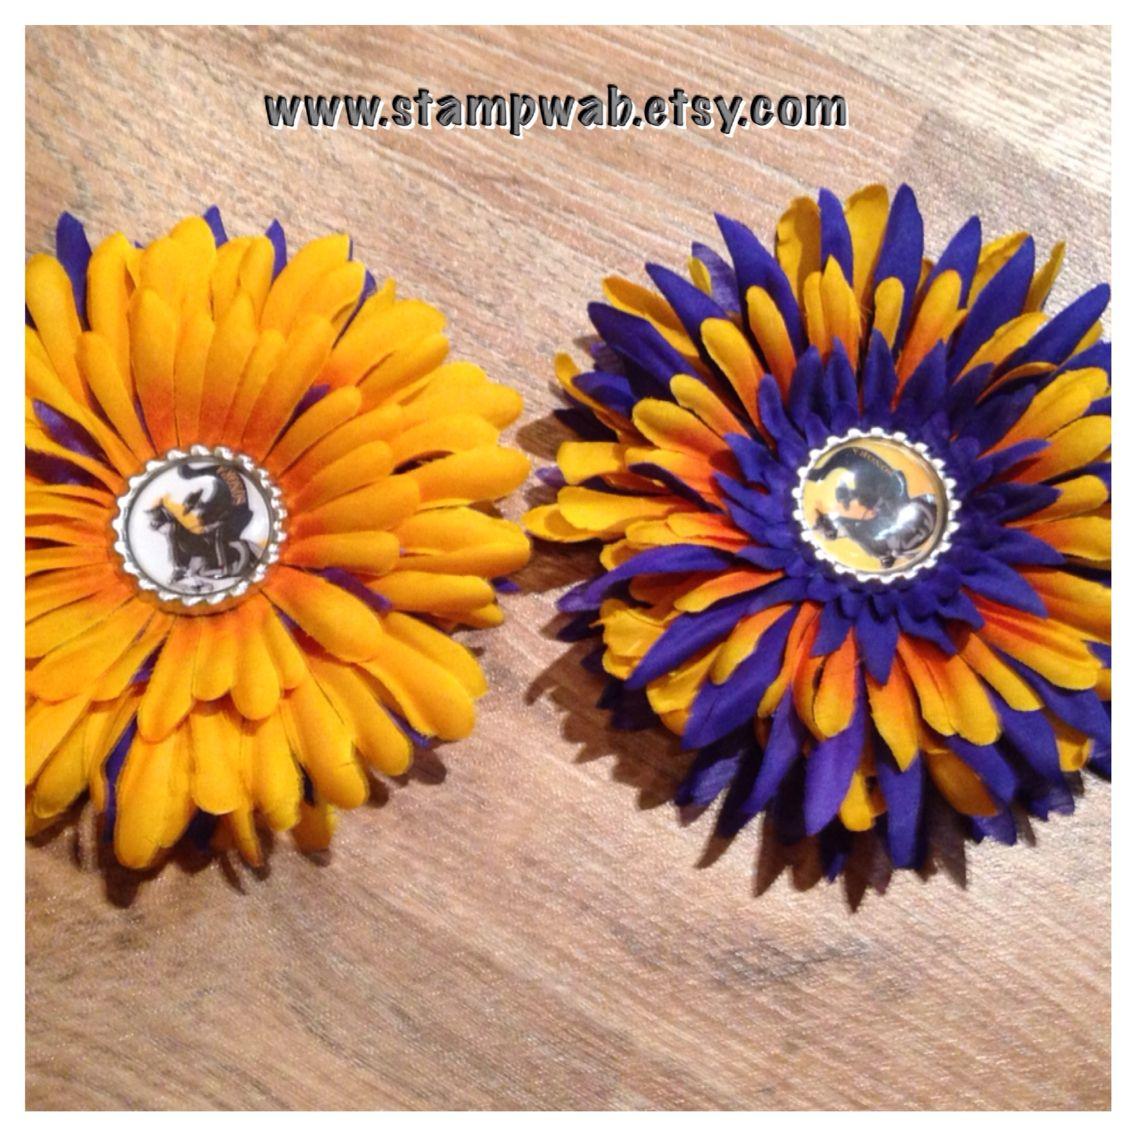 School Spirit flower hair pins www.stampwab.etsy.com